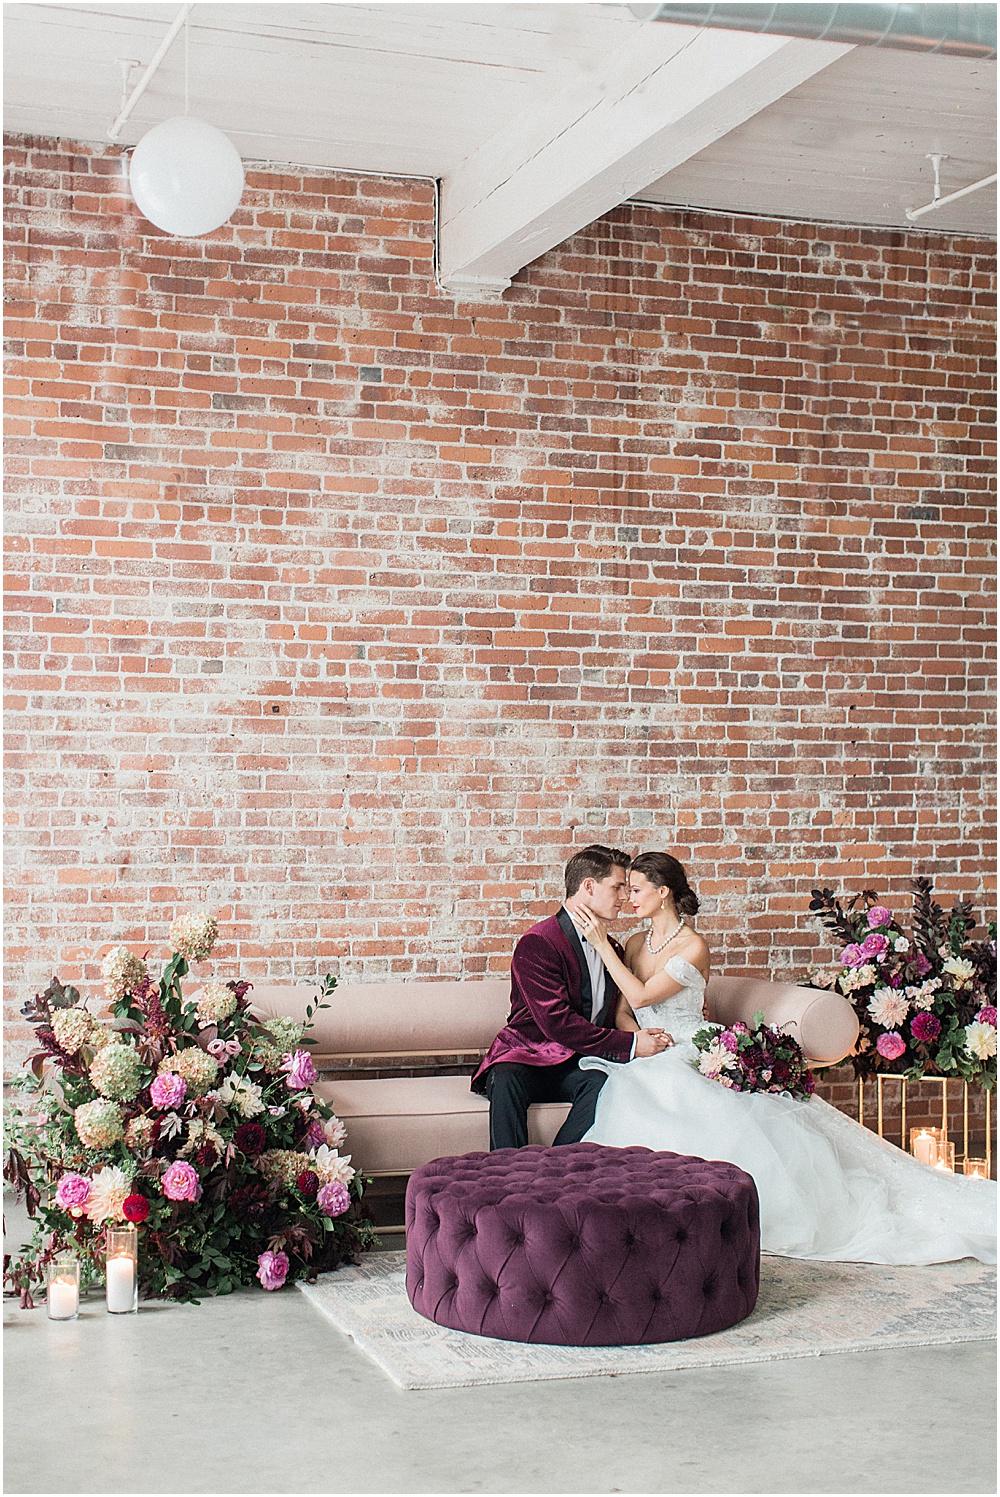 styled_shoot_fall_valentines_day_wedding_rhodi_island_ma_boston_wedding_photographyer_meredith_jane_photography_photo_0032.jpg